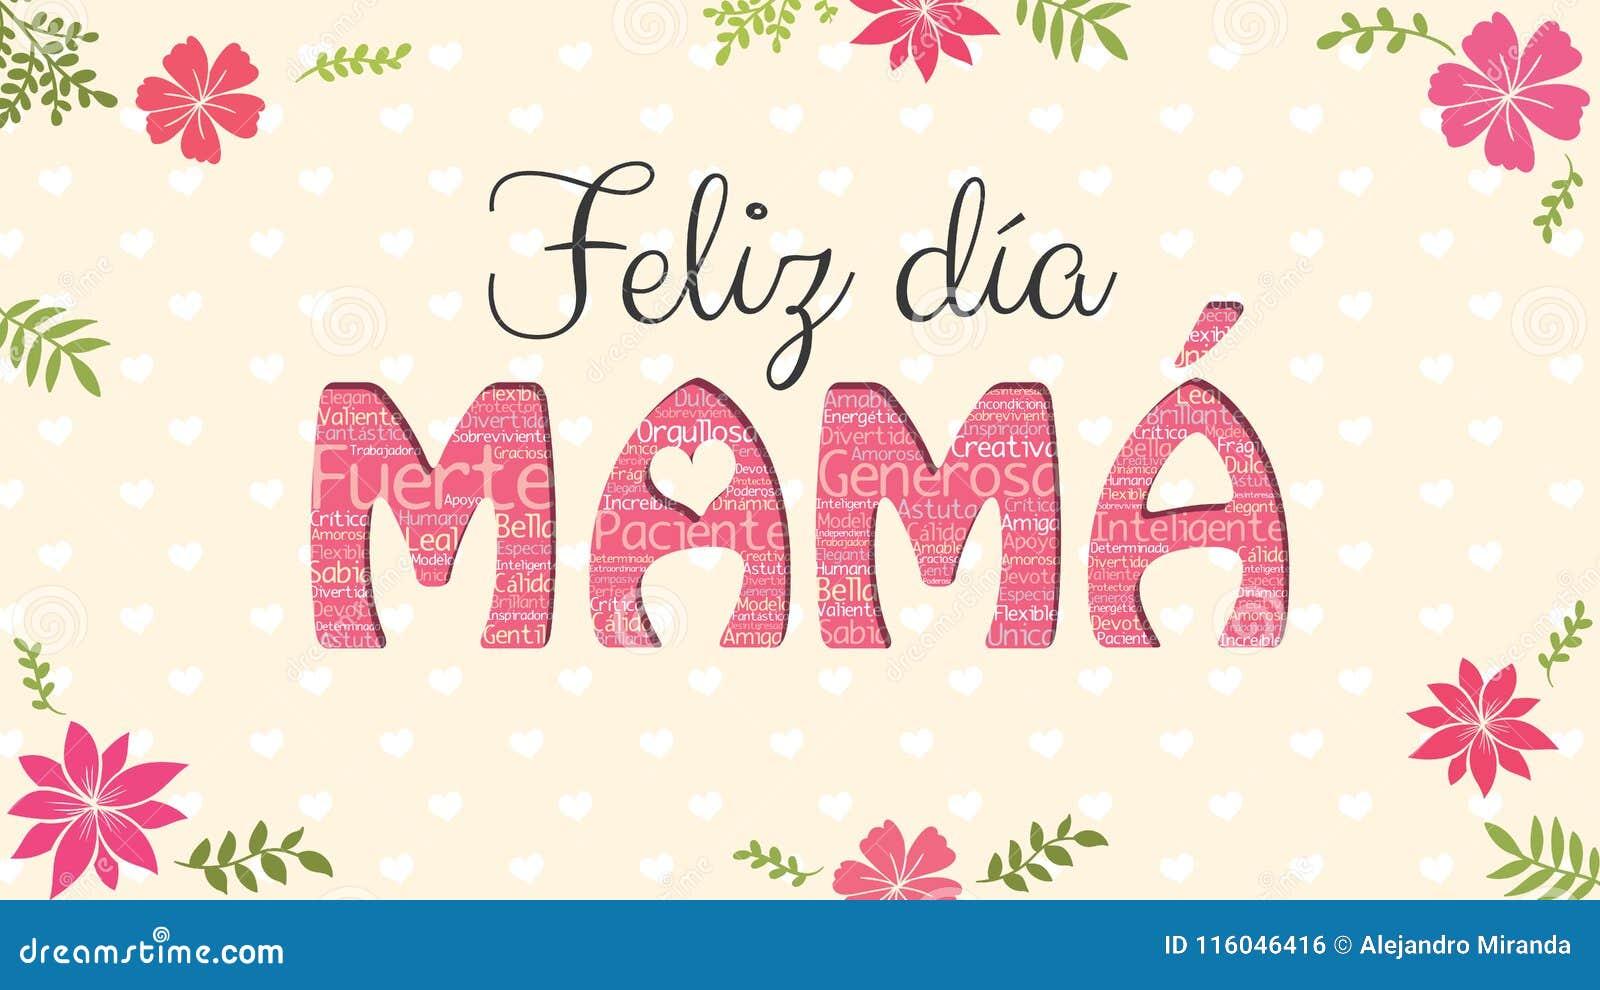 Feliz Dia MAMA - Happy Day MOM In Spanish Language - Greeting Card ...